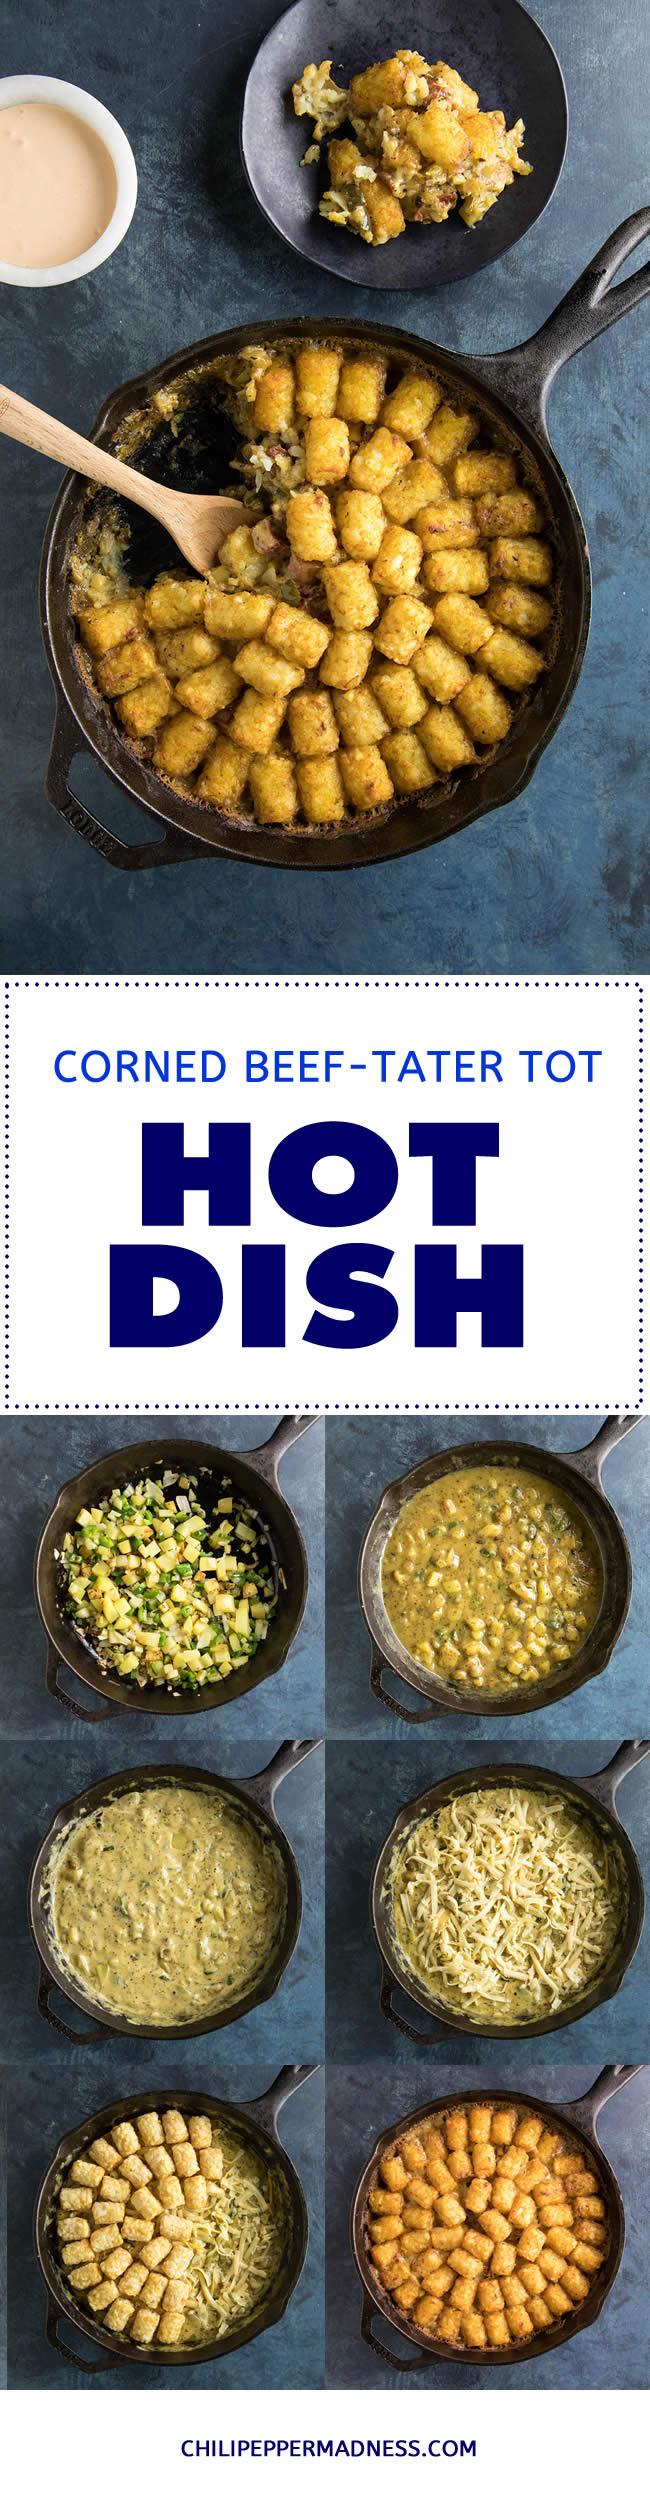 Corned Beef Tater Tot Hotdish (Casserole) - Recipe #tatertots #tots #hotdish #cornedbeef #casserole